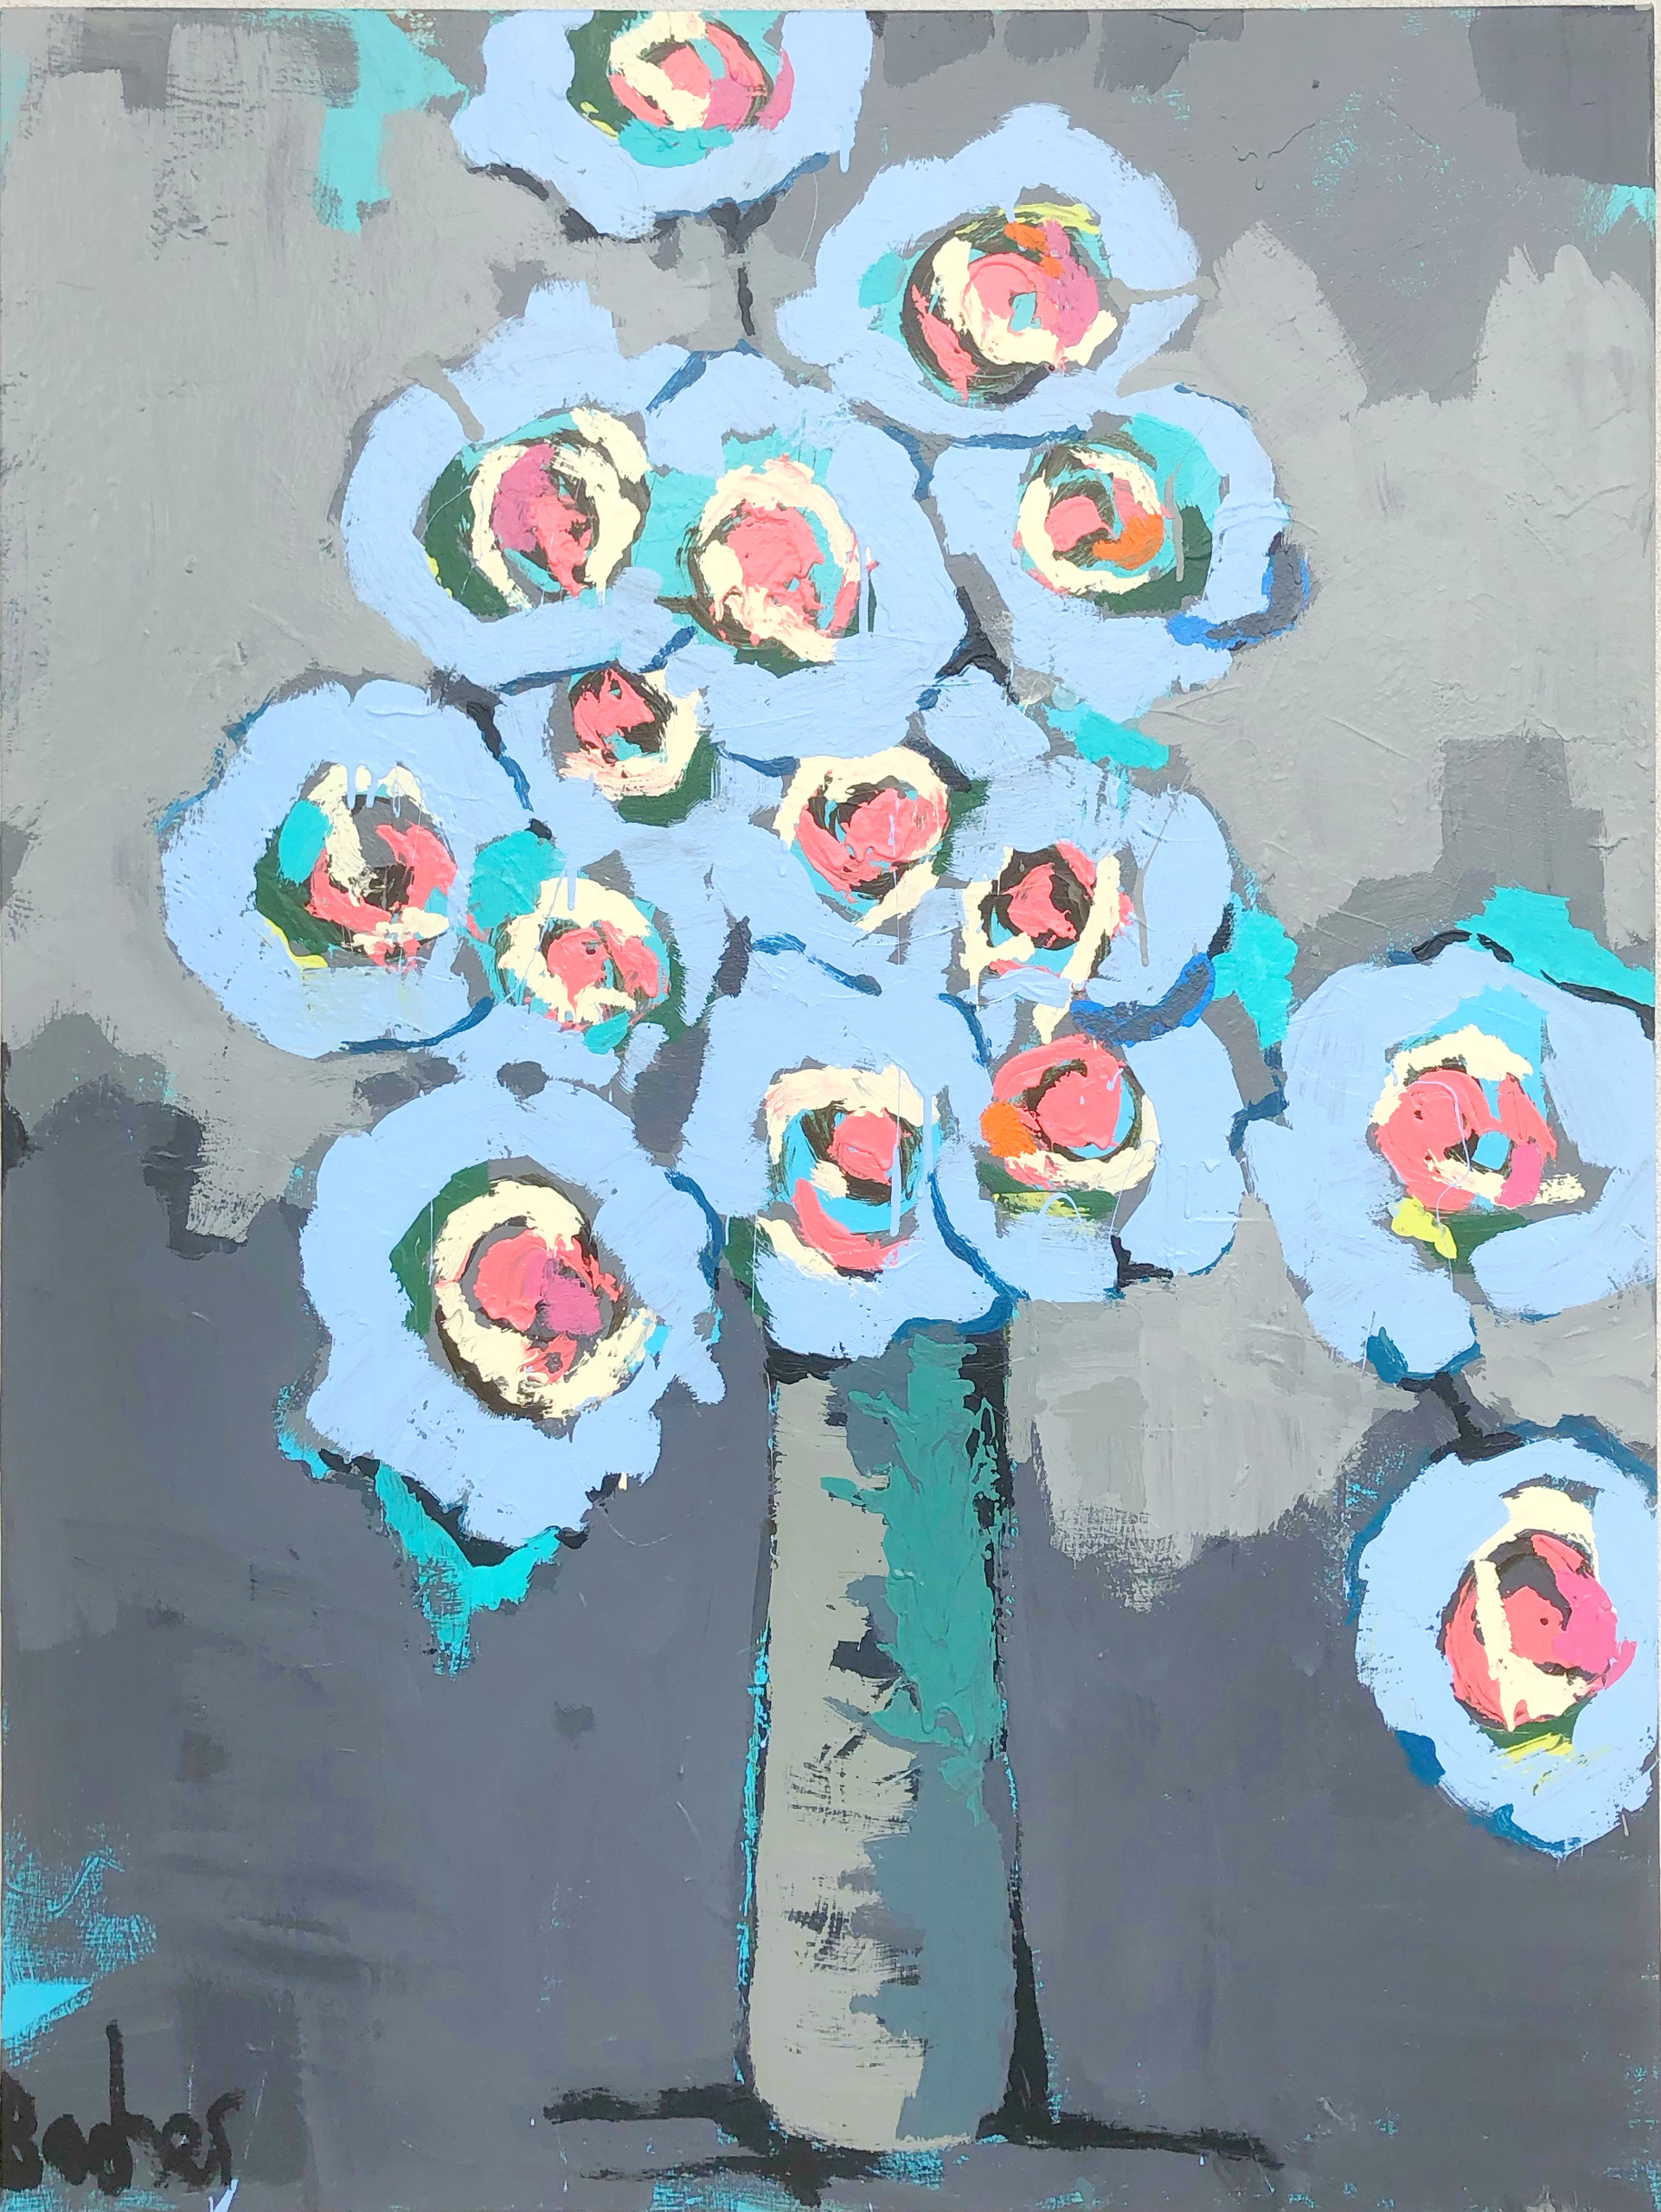 Cascading Bloom by Gary Bodner